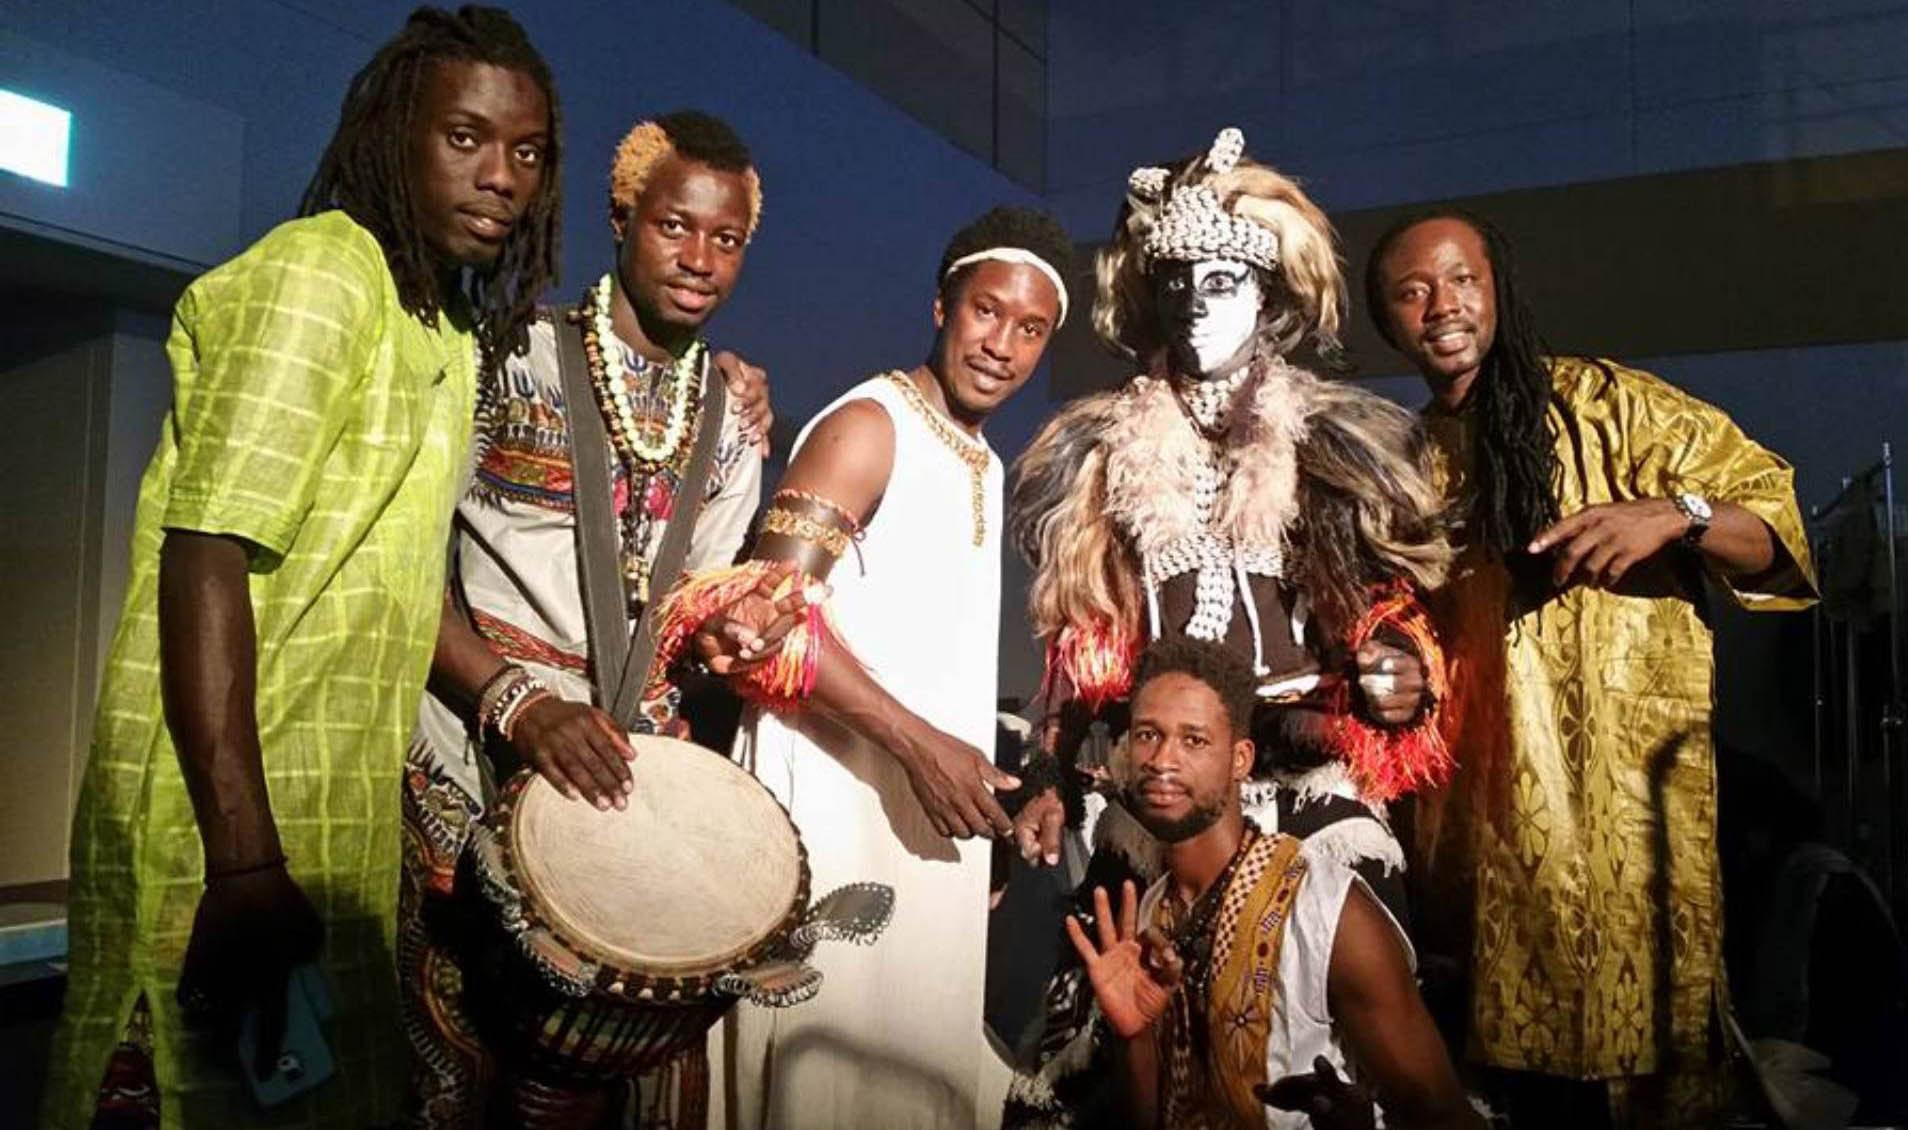 Bayefall Revolutionアフリカ音楽&ダンス